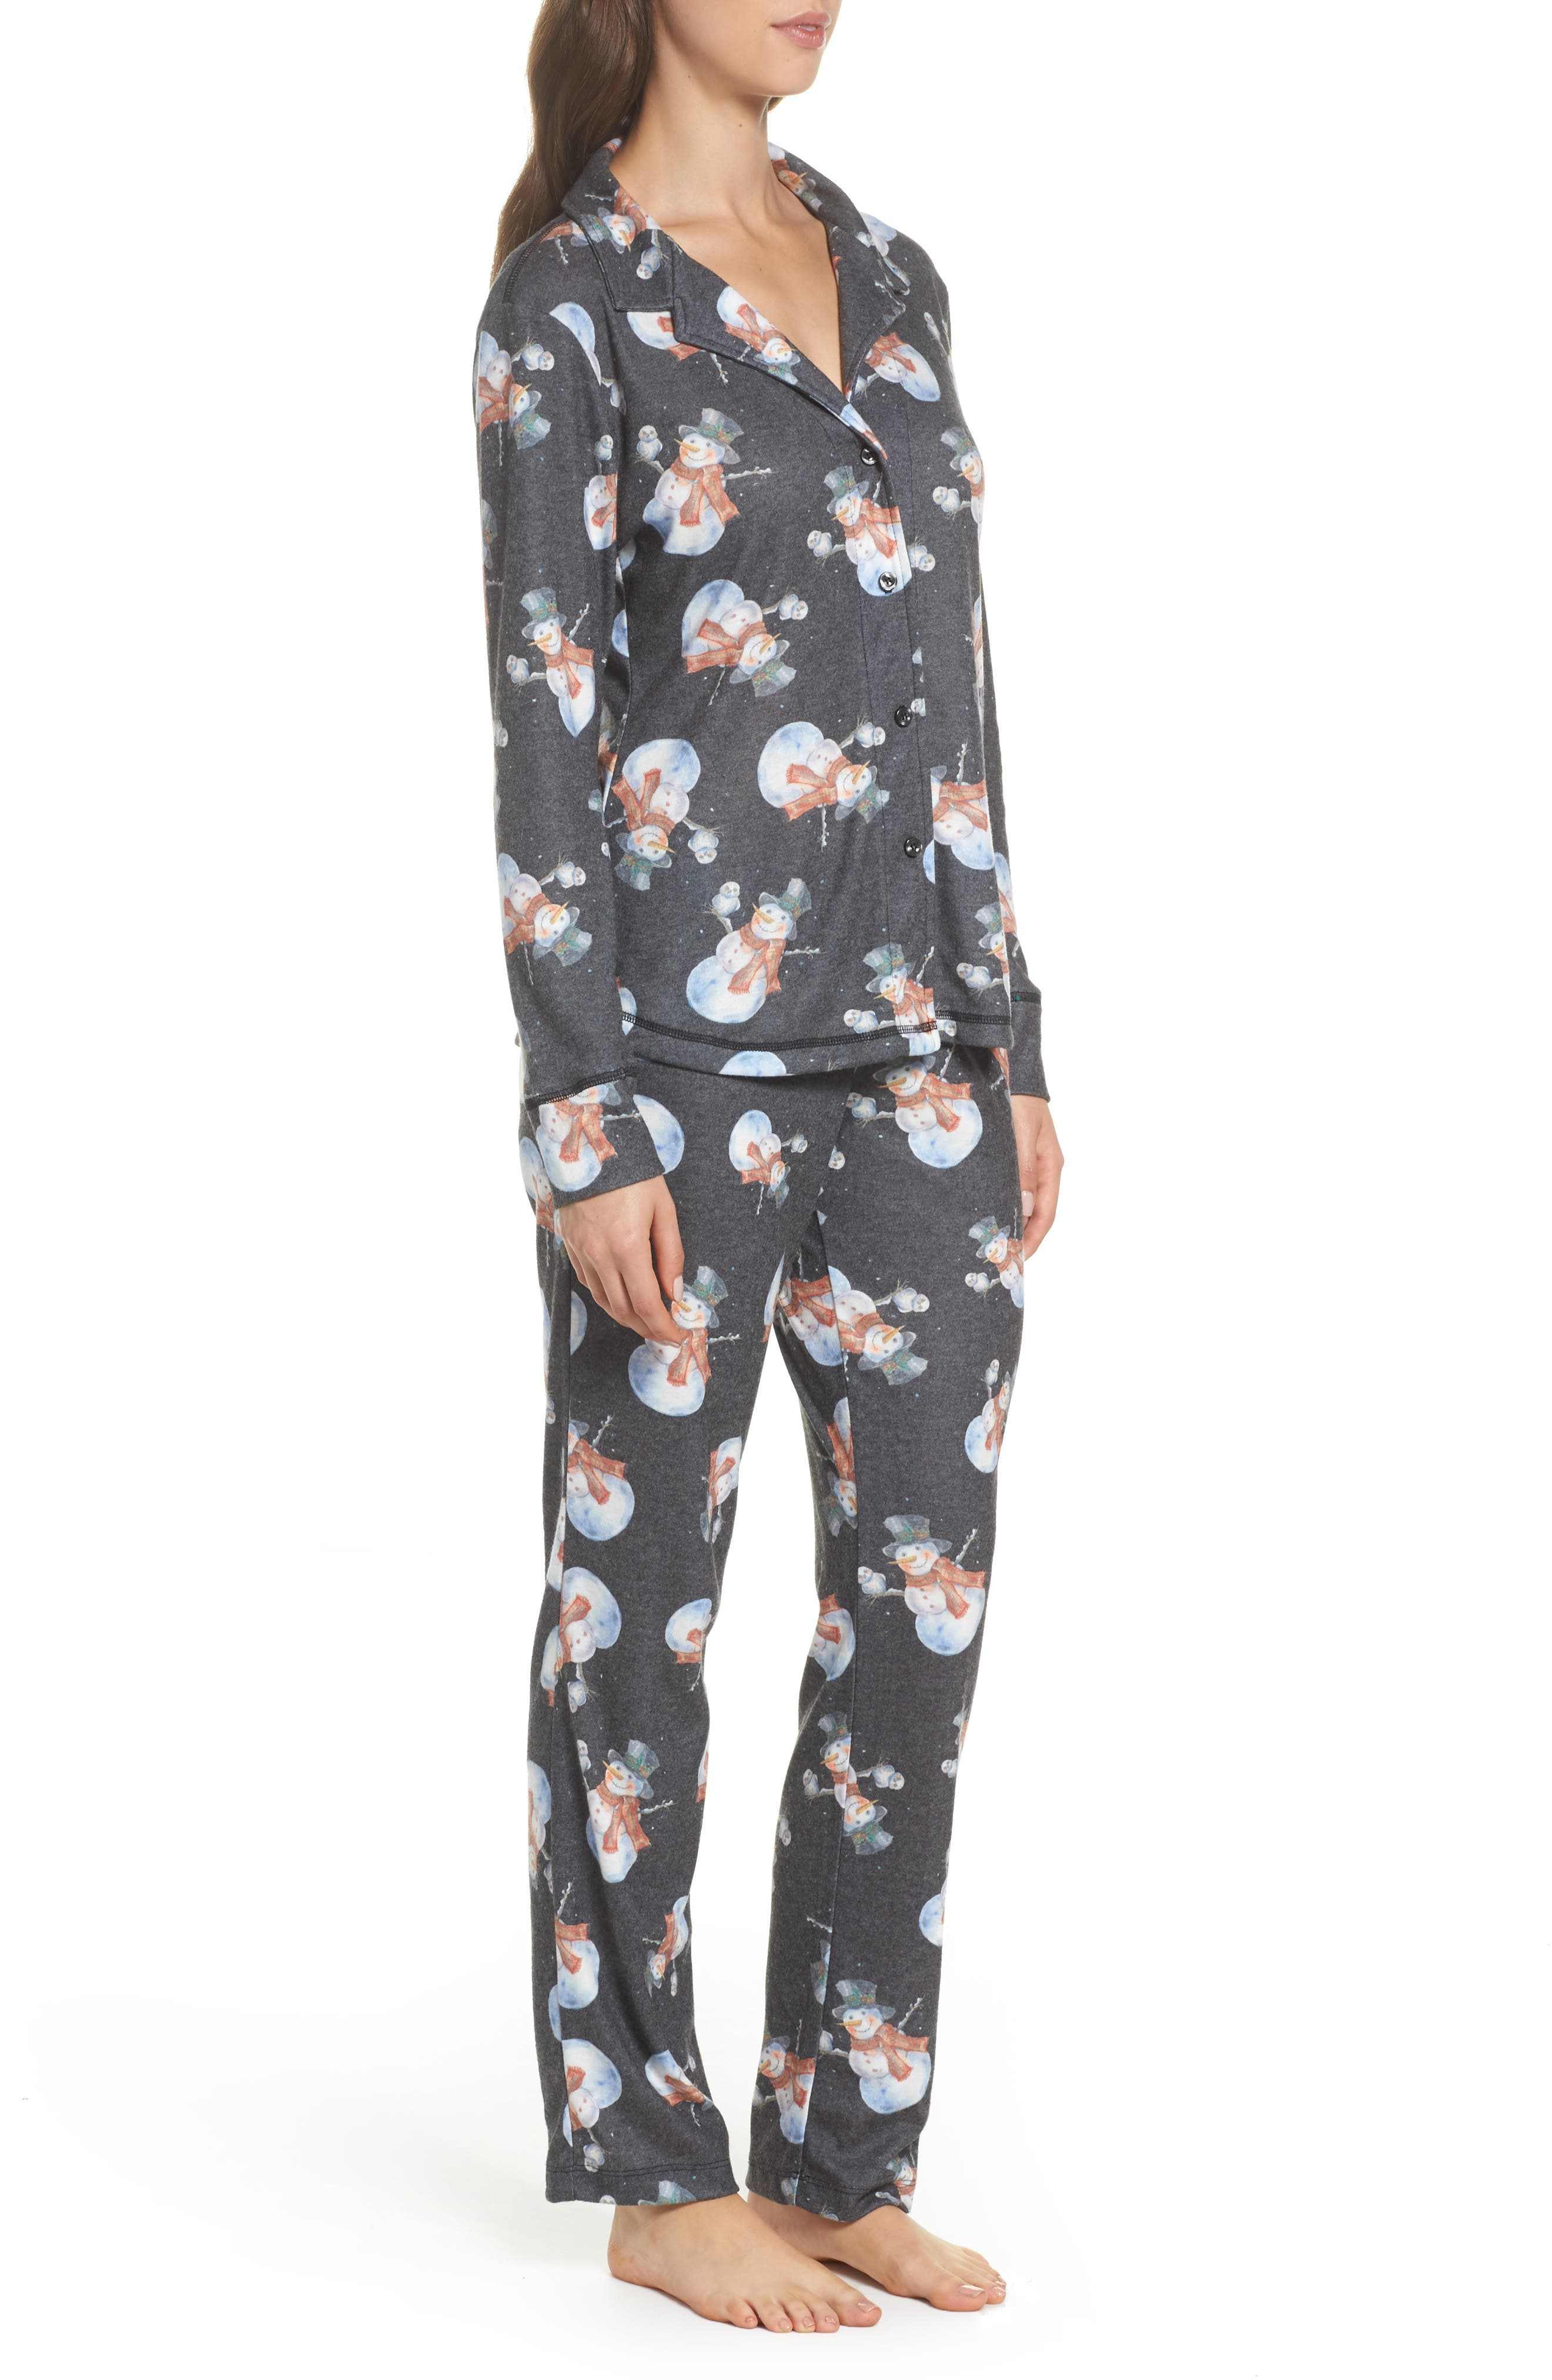 Clara Flannel Pajamas,                             Alternate thumbnail 3, color,                             001